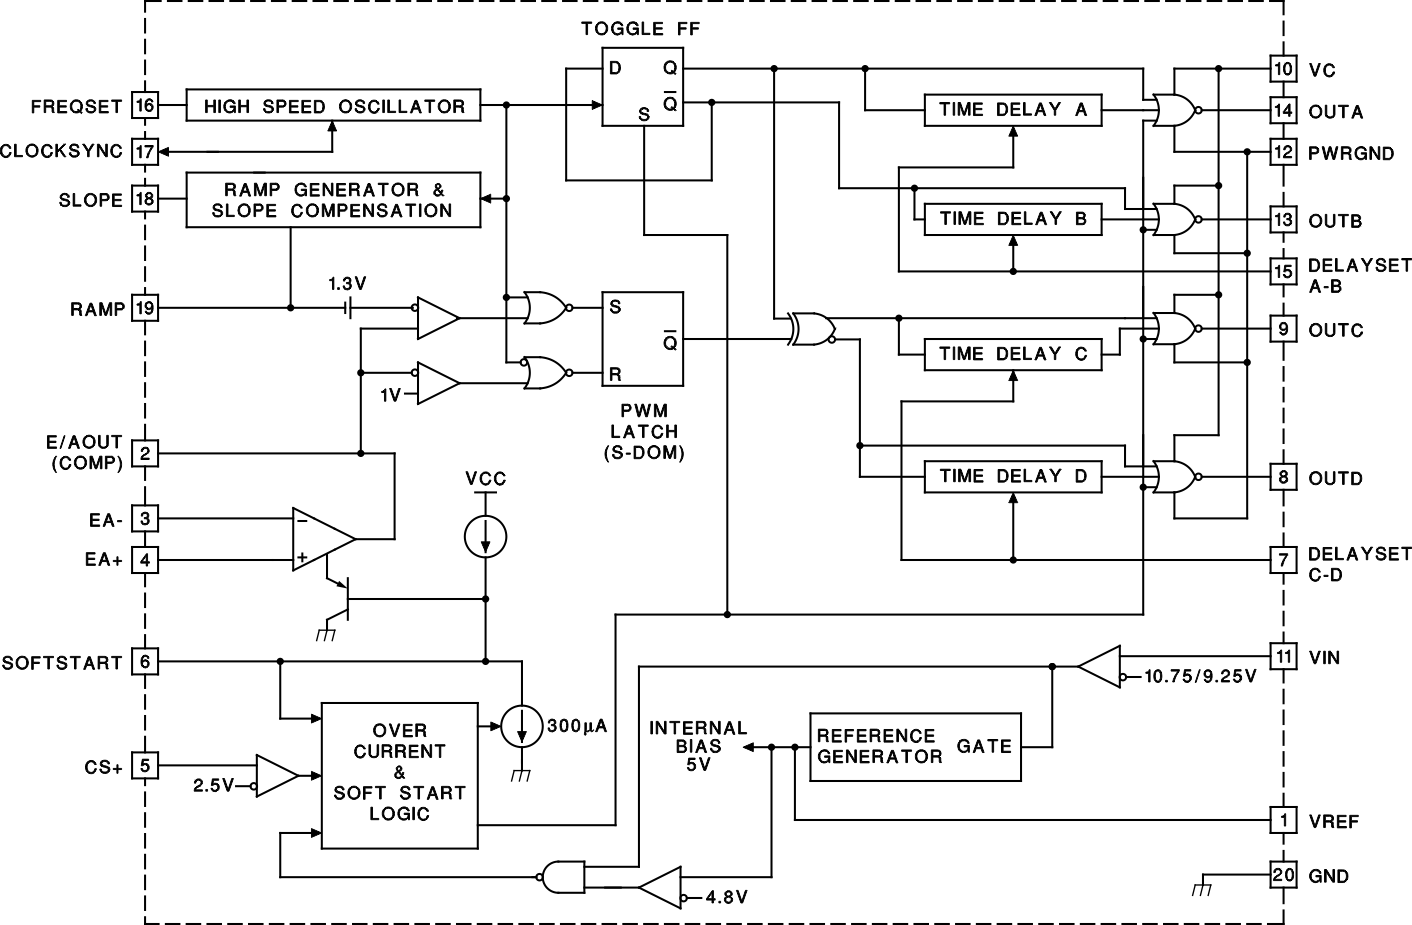 Uc1875 Sp Of A Series Resonant Oscillator Circuit Using Ttl Nand Gates 82 Functional Block Diagram